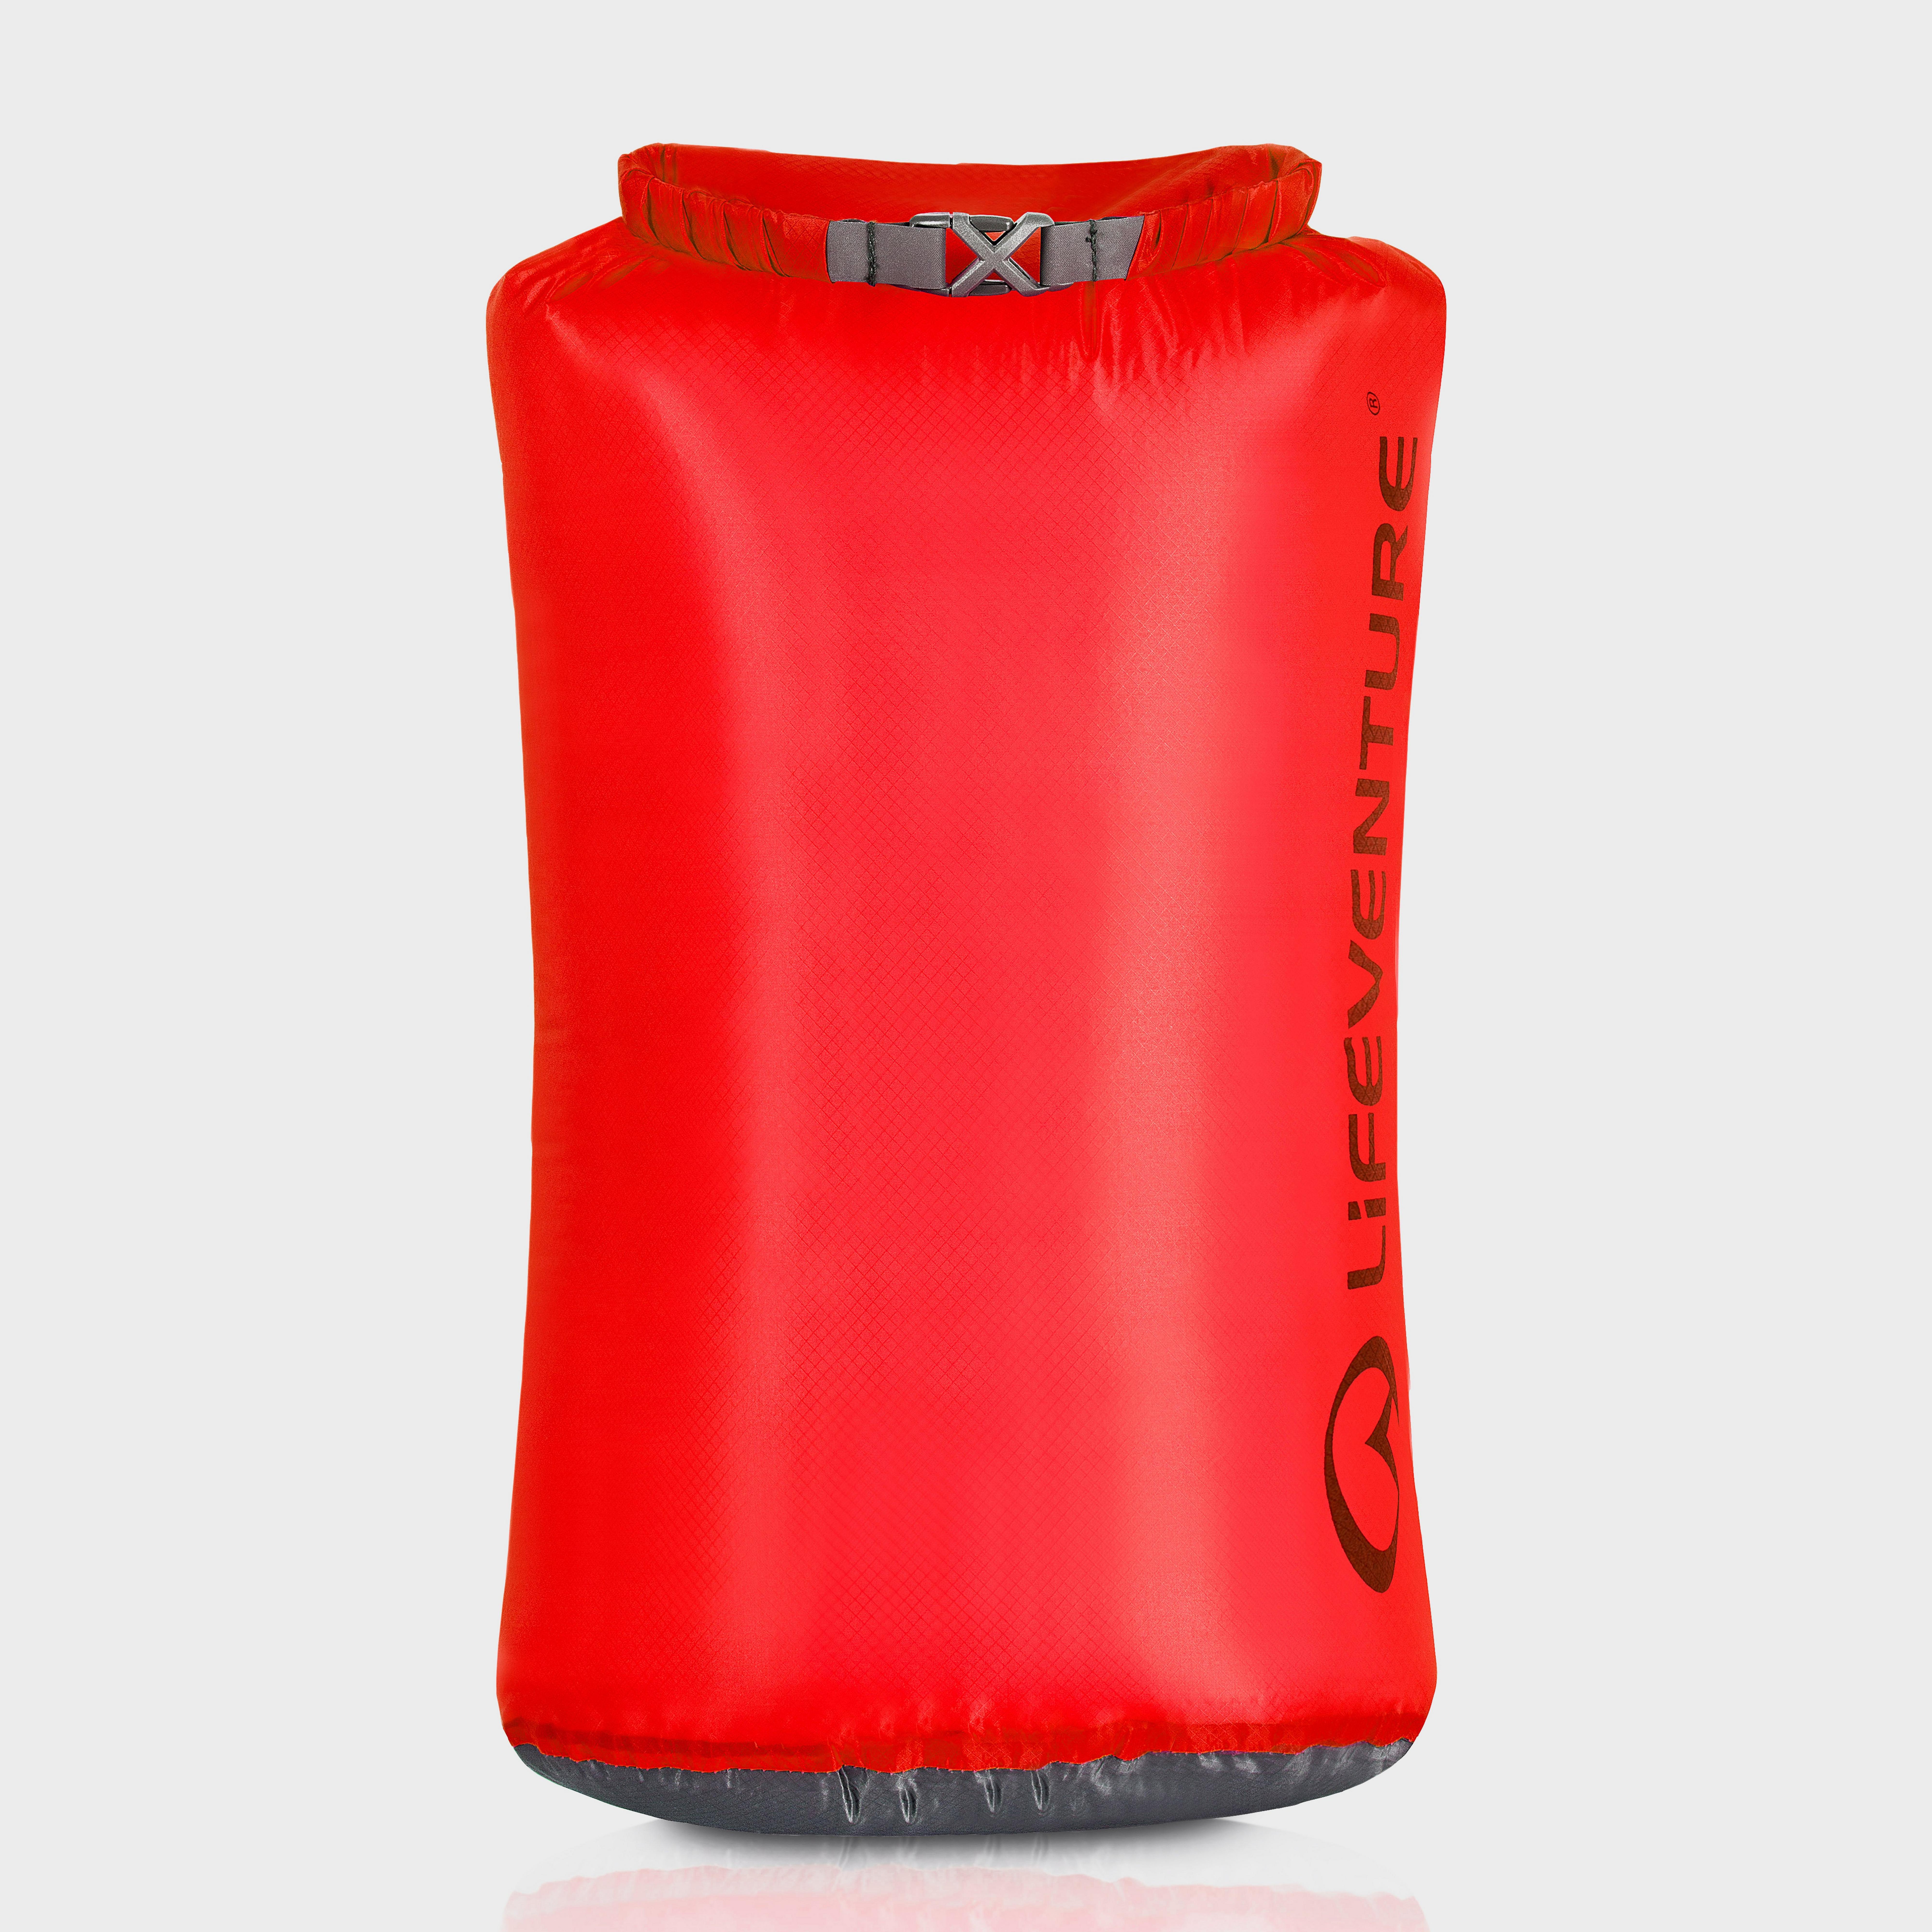 Lifeventure Lifeventure Ultralight 25L Dry Bag - N/A, N/A